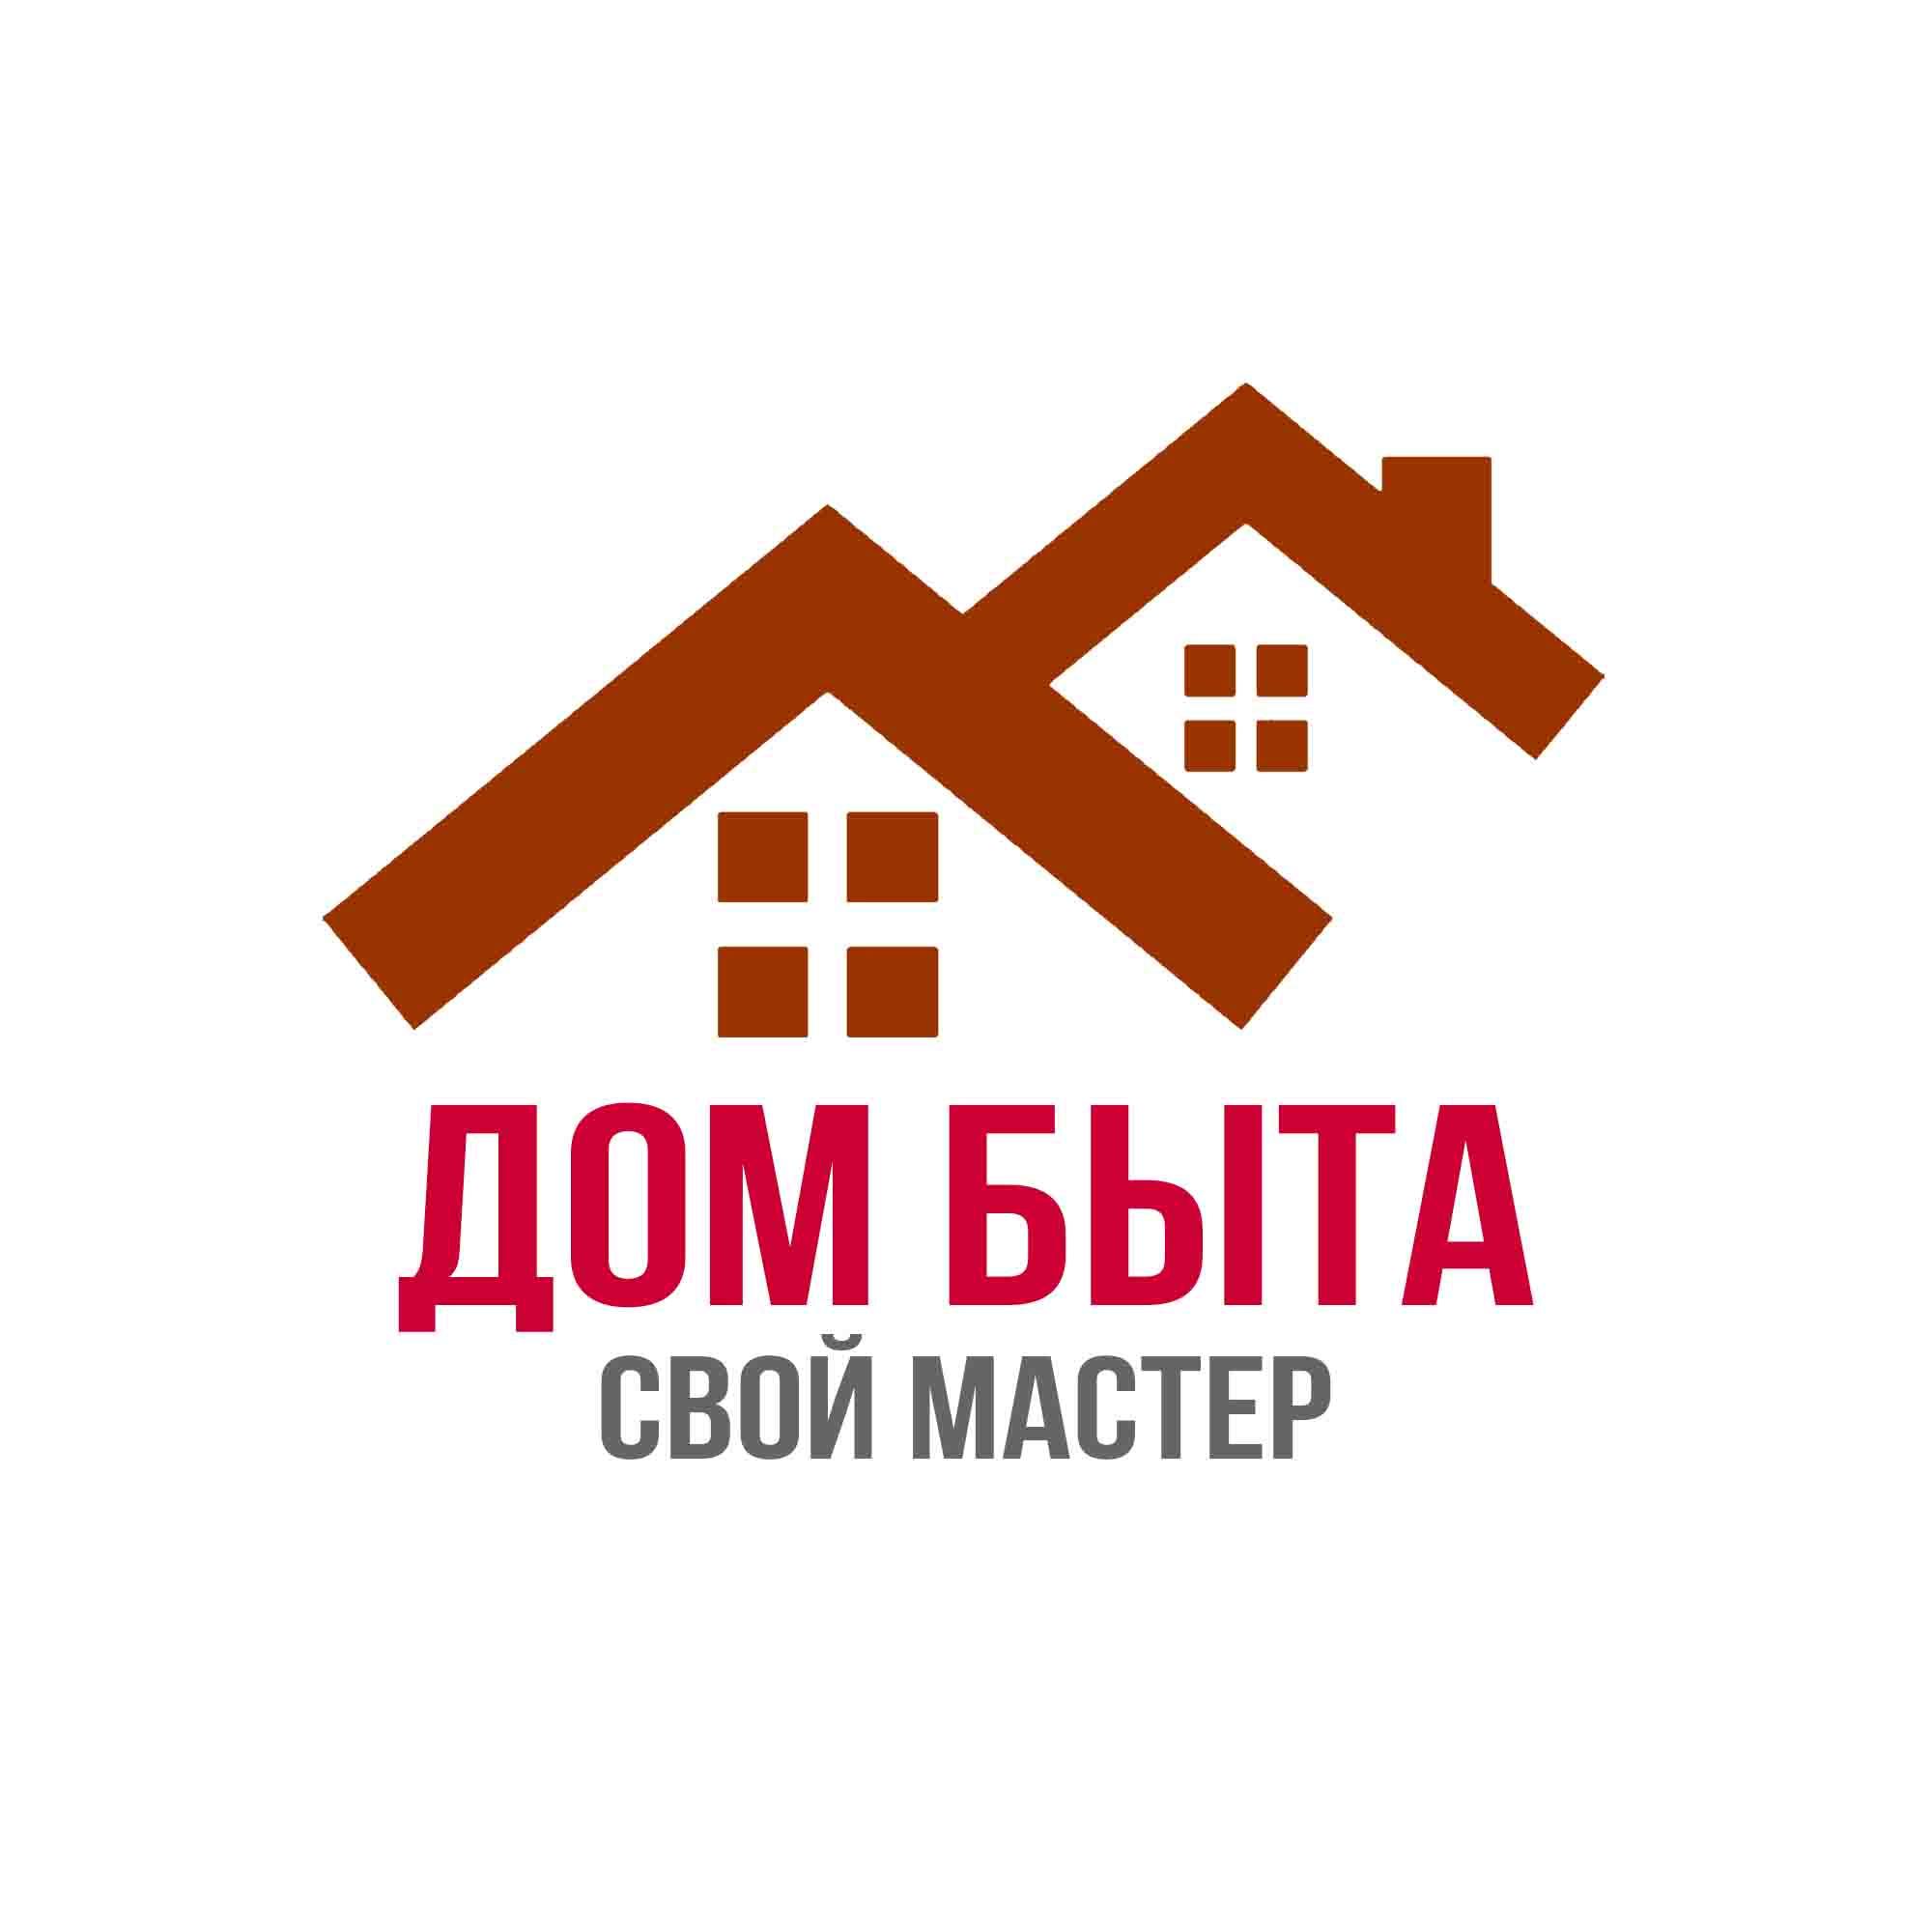 Логотип для сетевого ДОМ БЫТА фото f_5365d724093599f9.jpg